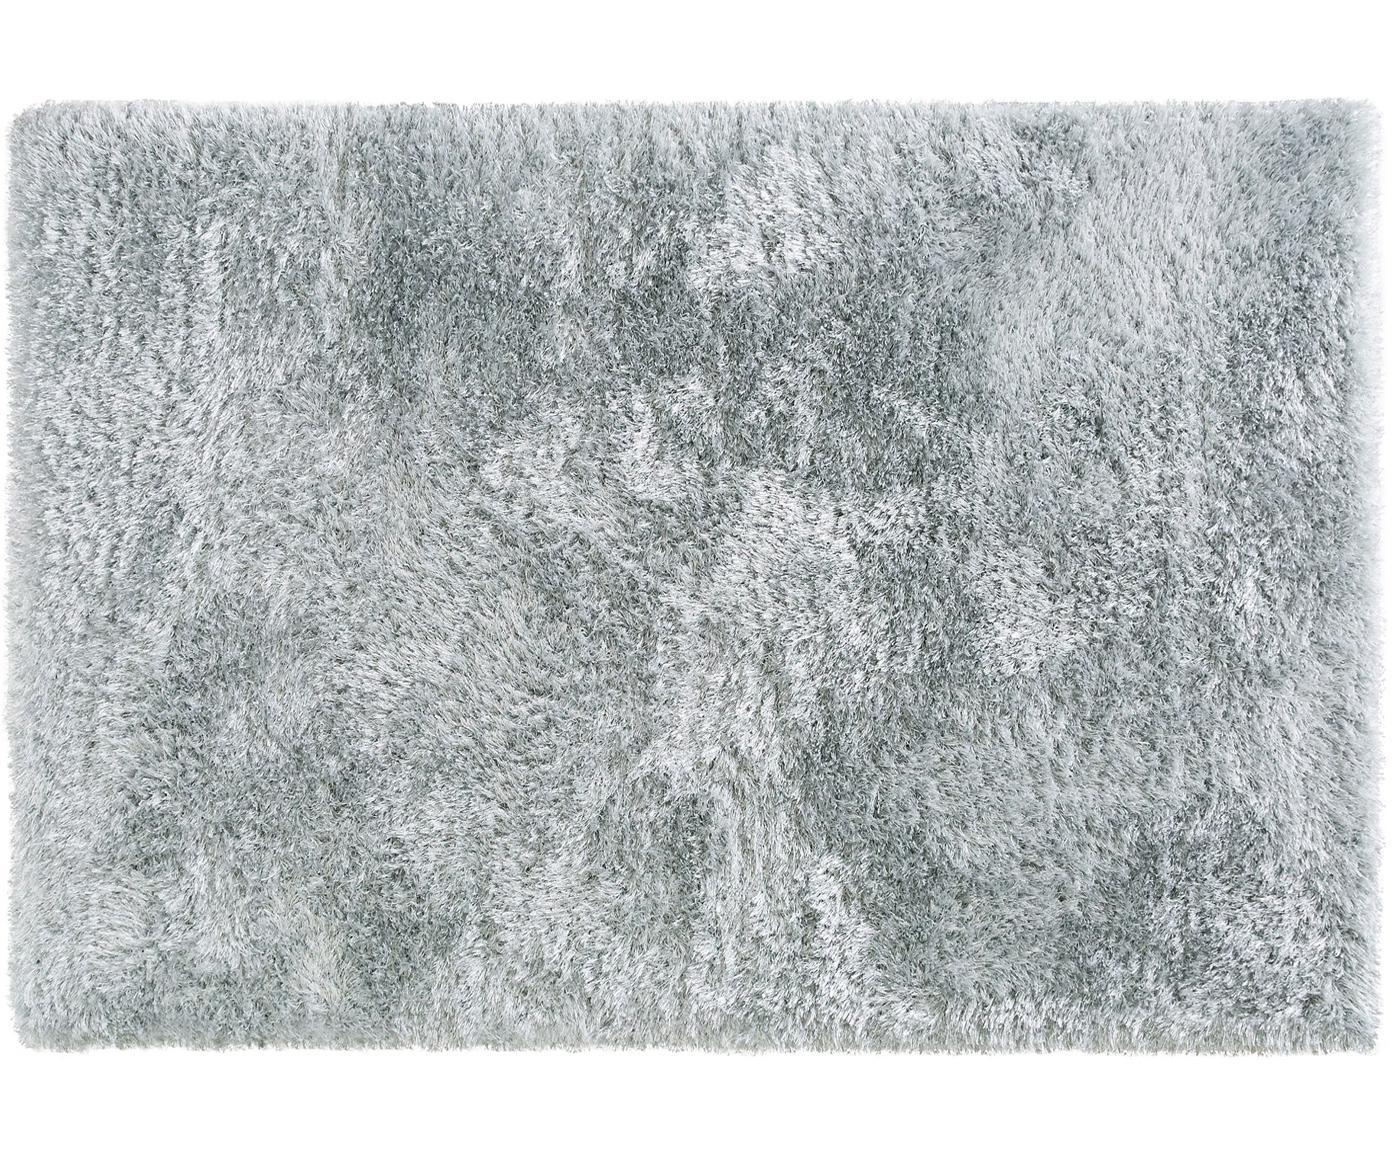 Glanzend hoogpolig vloerkleed Lea, 50% polyester, 50% polypropyleen, Lichtblauw, B 160 x L 230 cm (maat M)